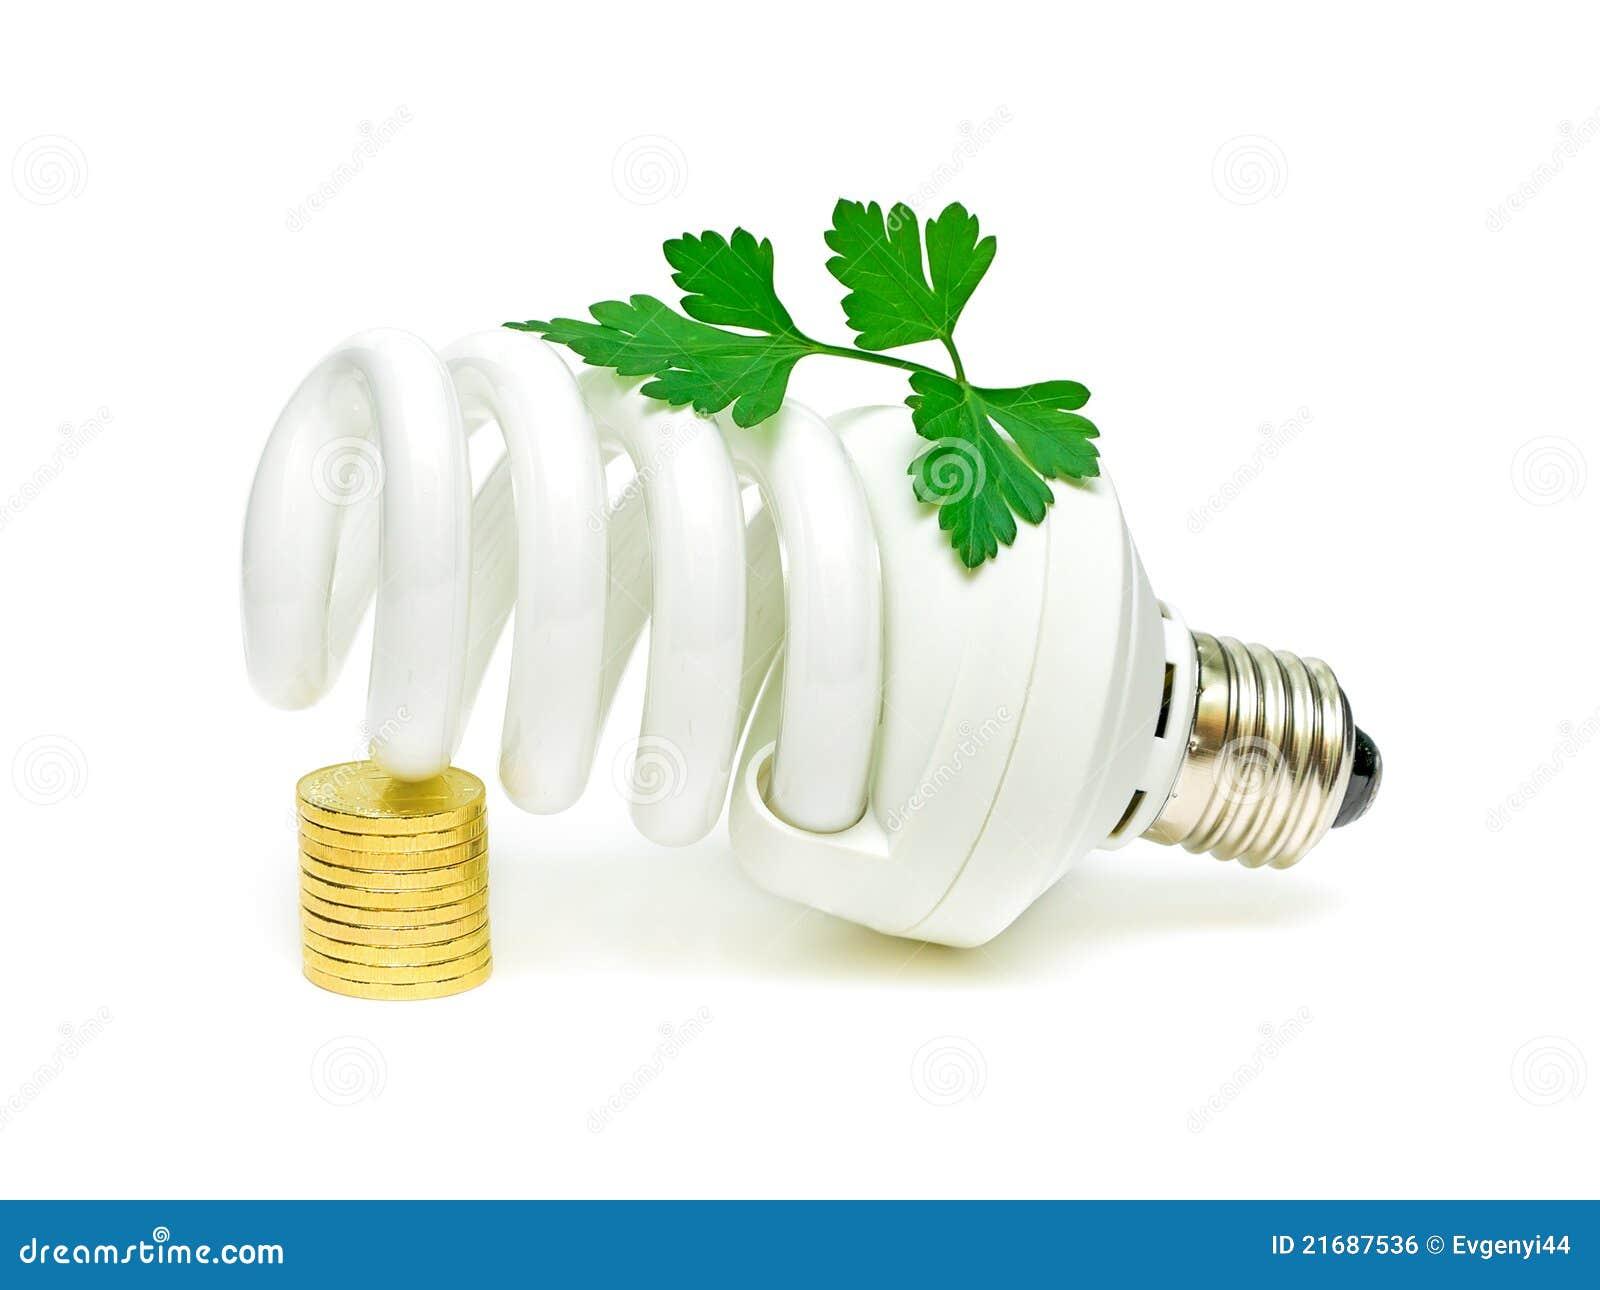 Energy Saving Light Bulb And A Green Plant Stock Photo Image Of